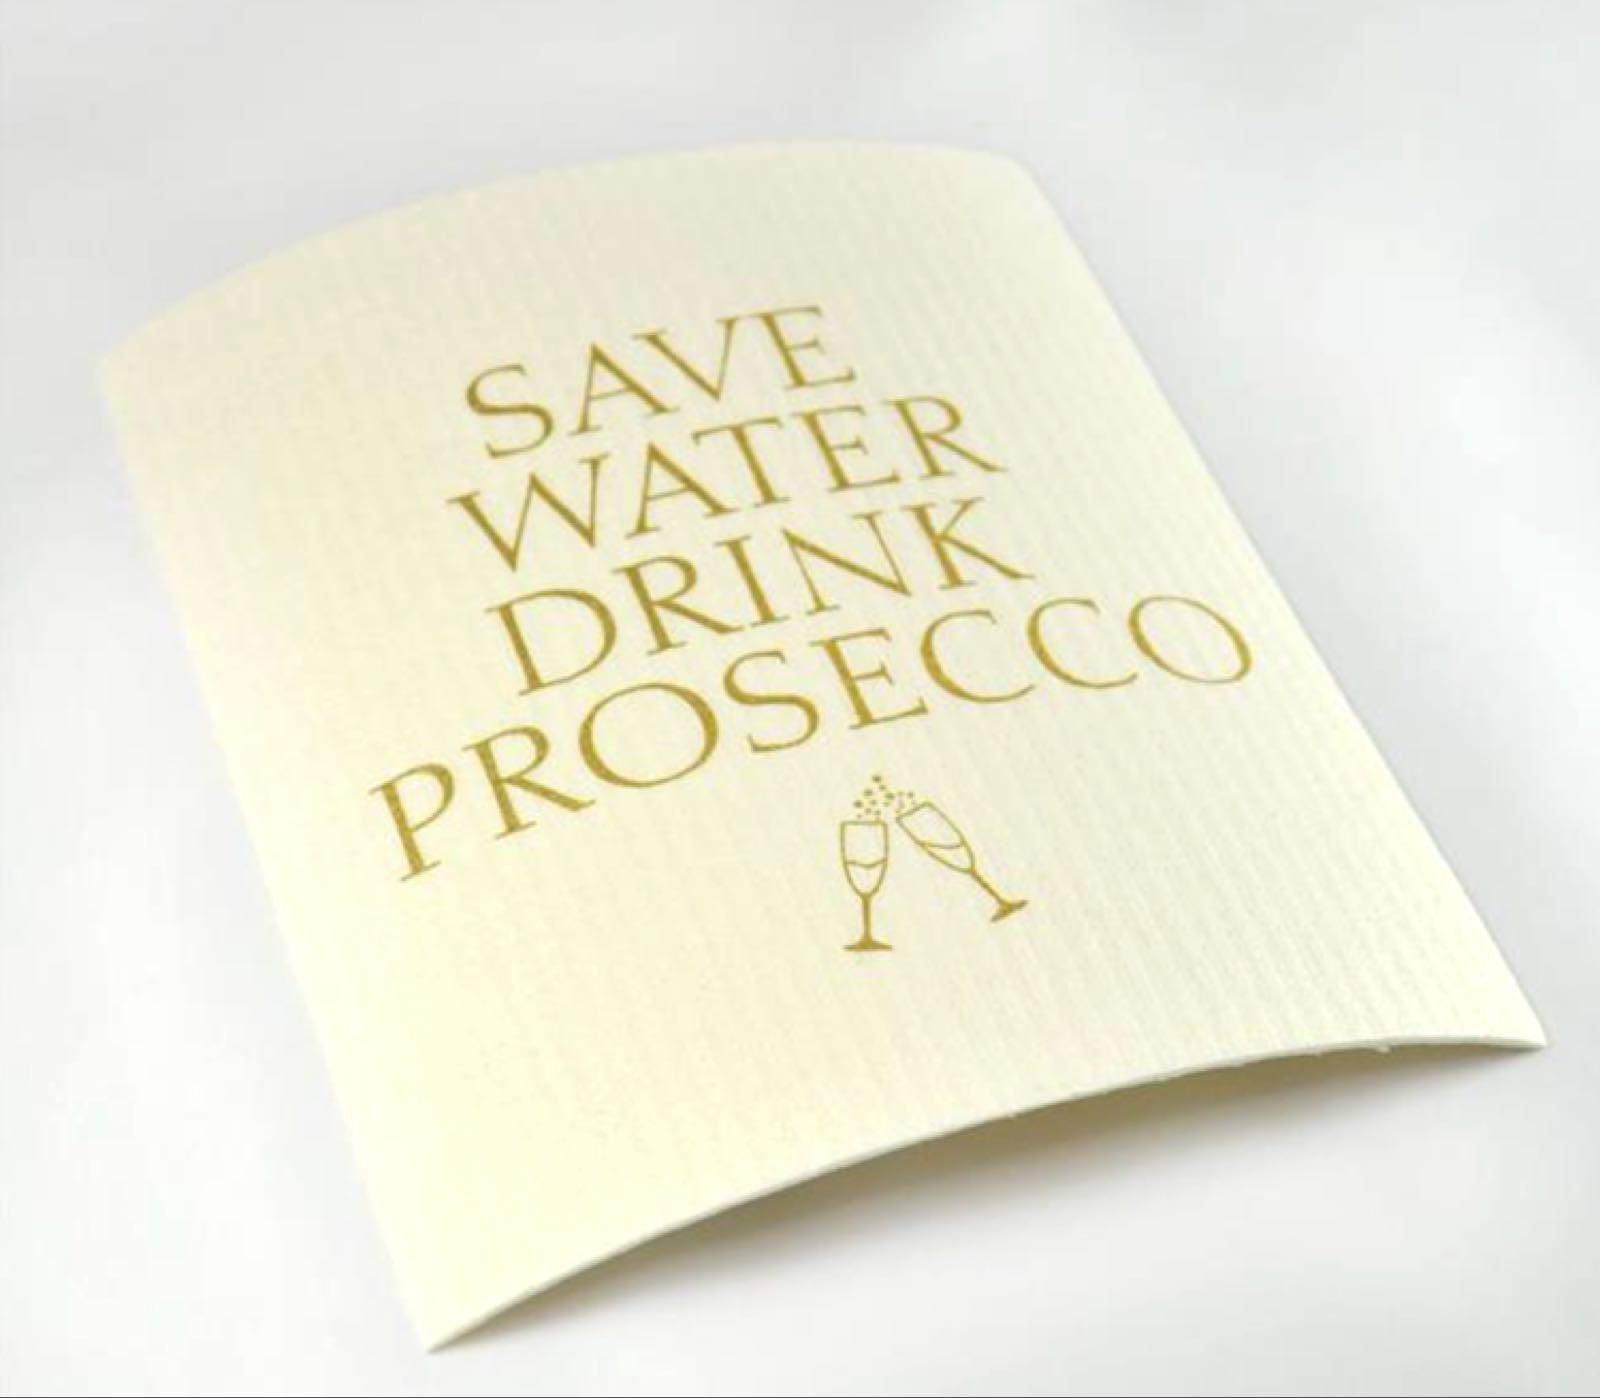 Mellow Design - Disktrasa, Prosecco, vit/guldtext